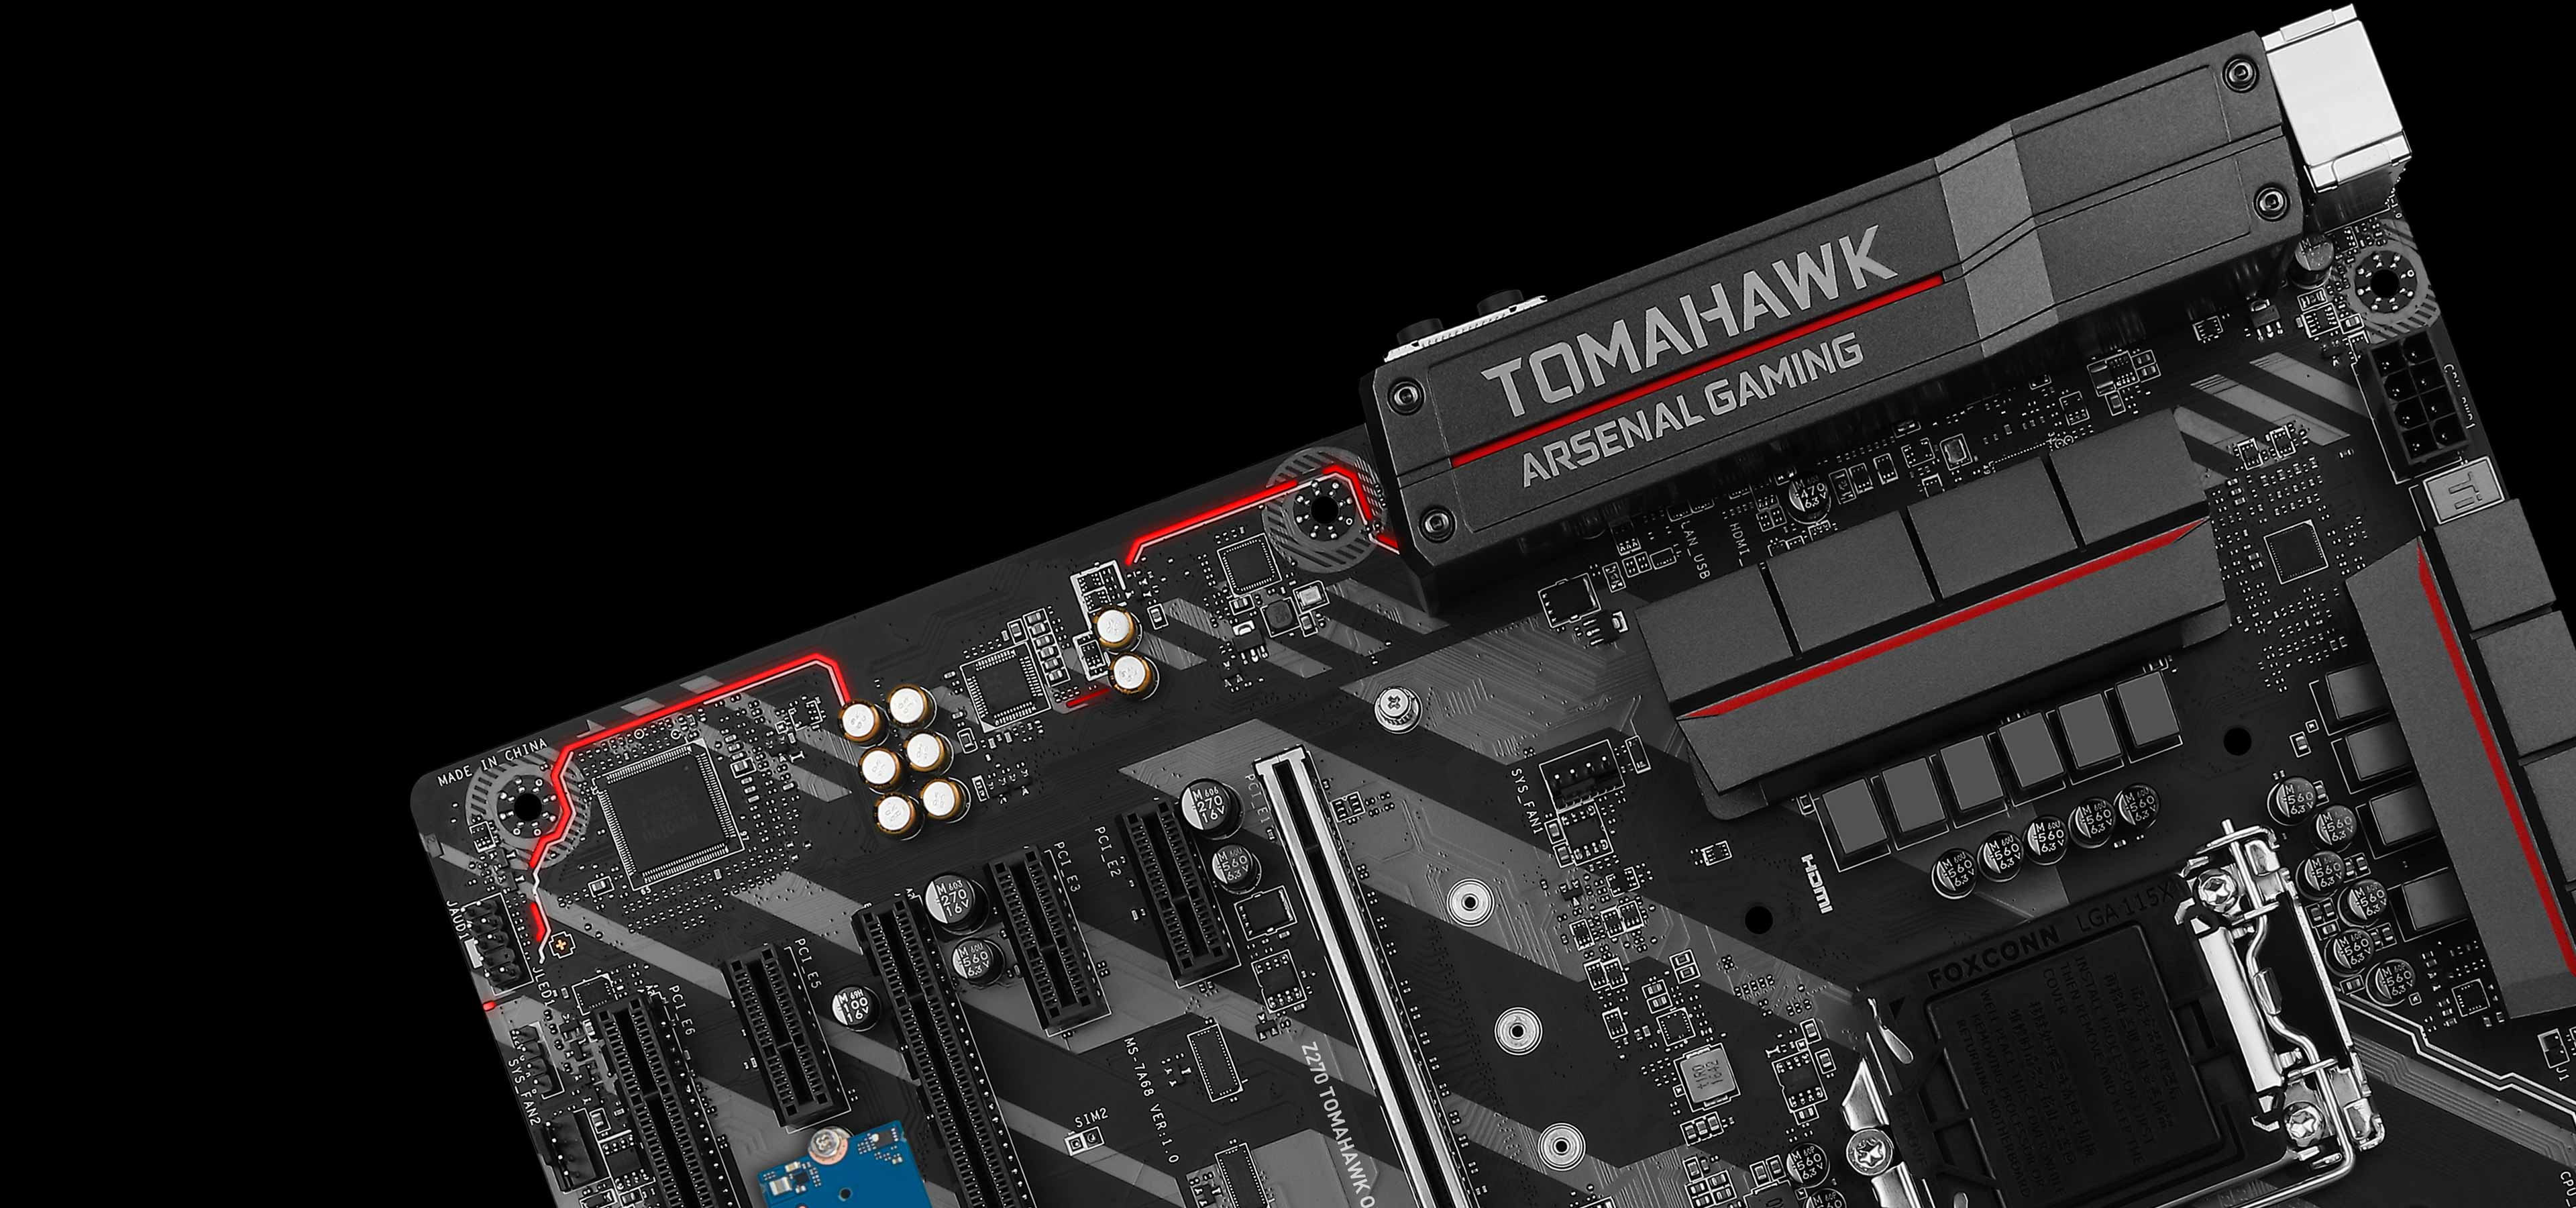 MSI Z270 TOMAHAWK OPT BOOST Gaming Intel Z270 DDR4 HDMI USB 3 CrossFire ATX Motherboard